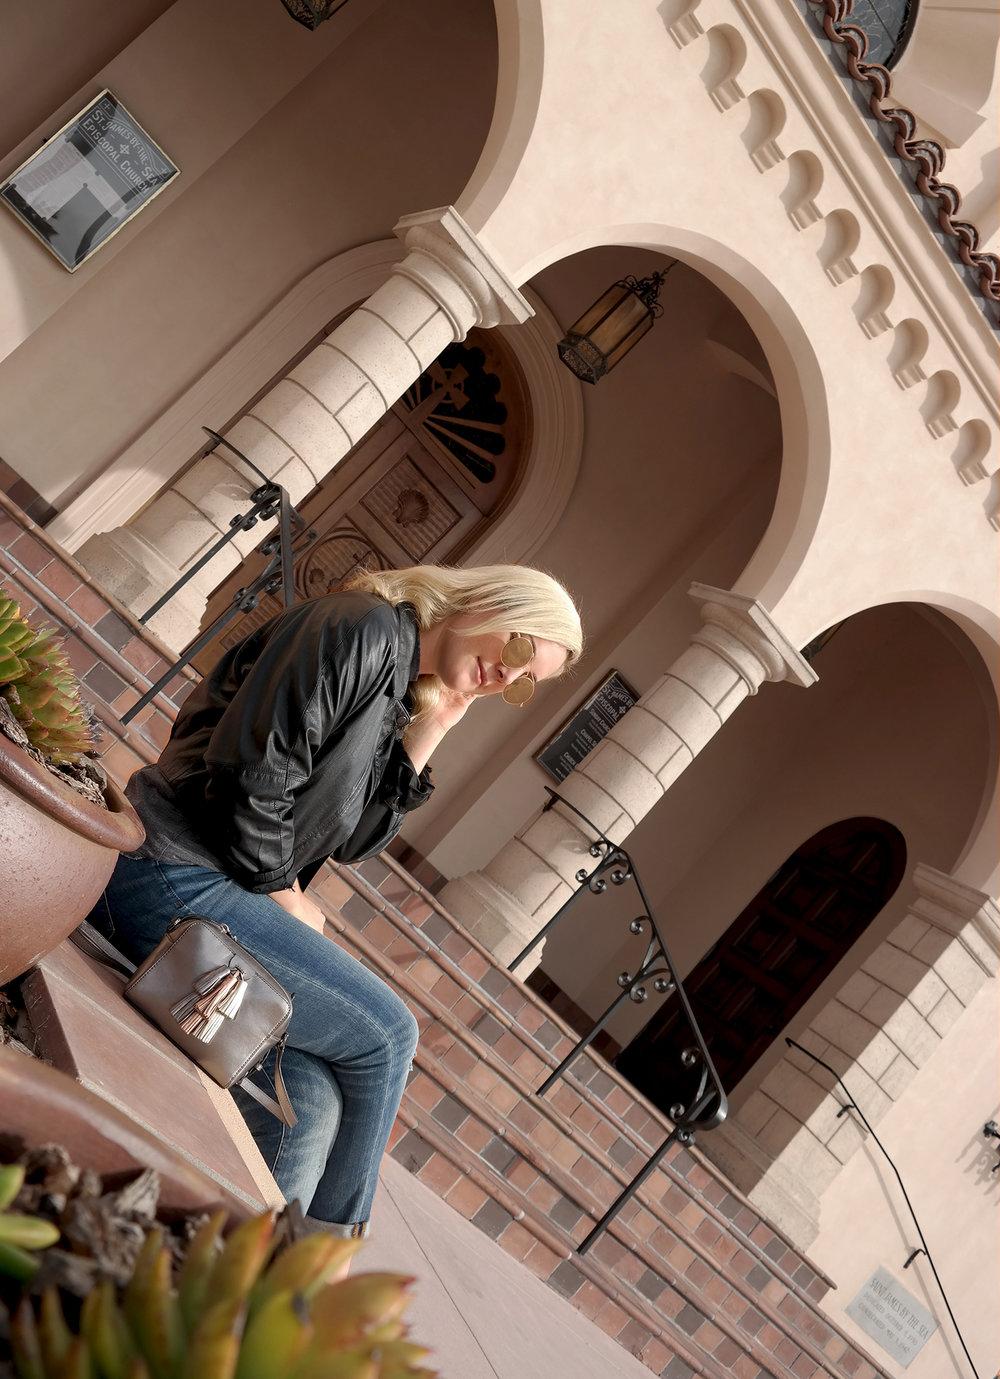 rebecca minkoff bag_Faith in Style 3.jpg